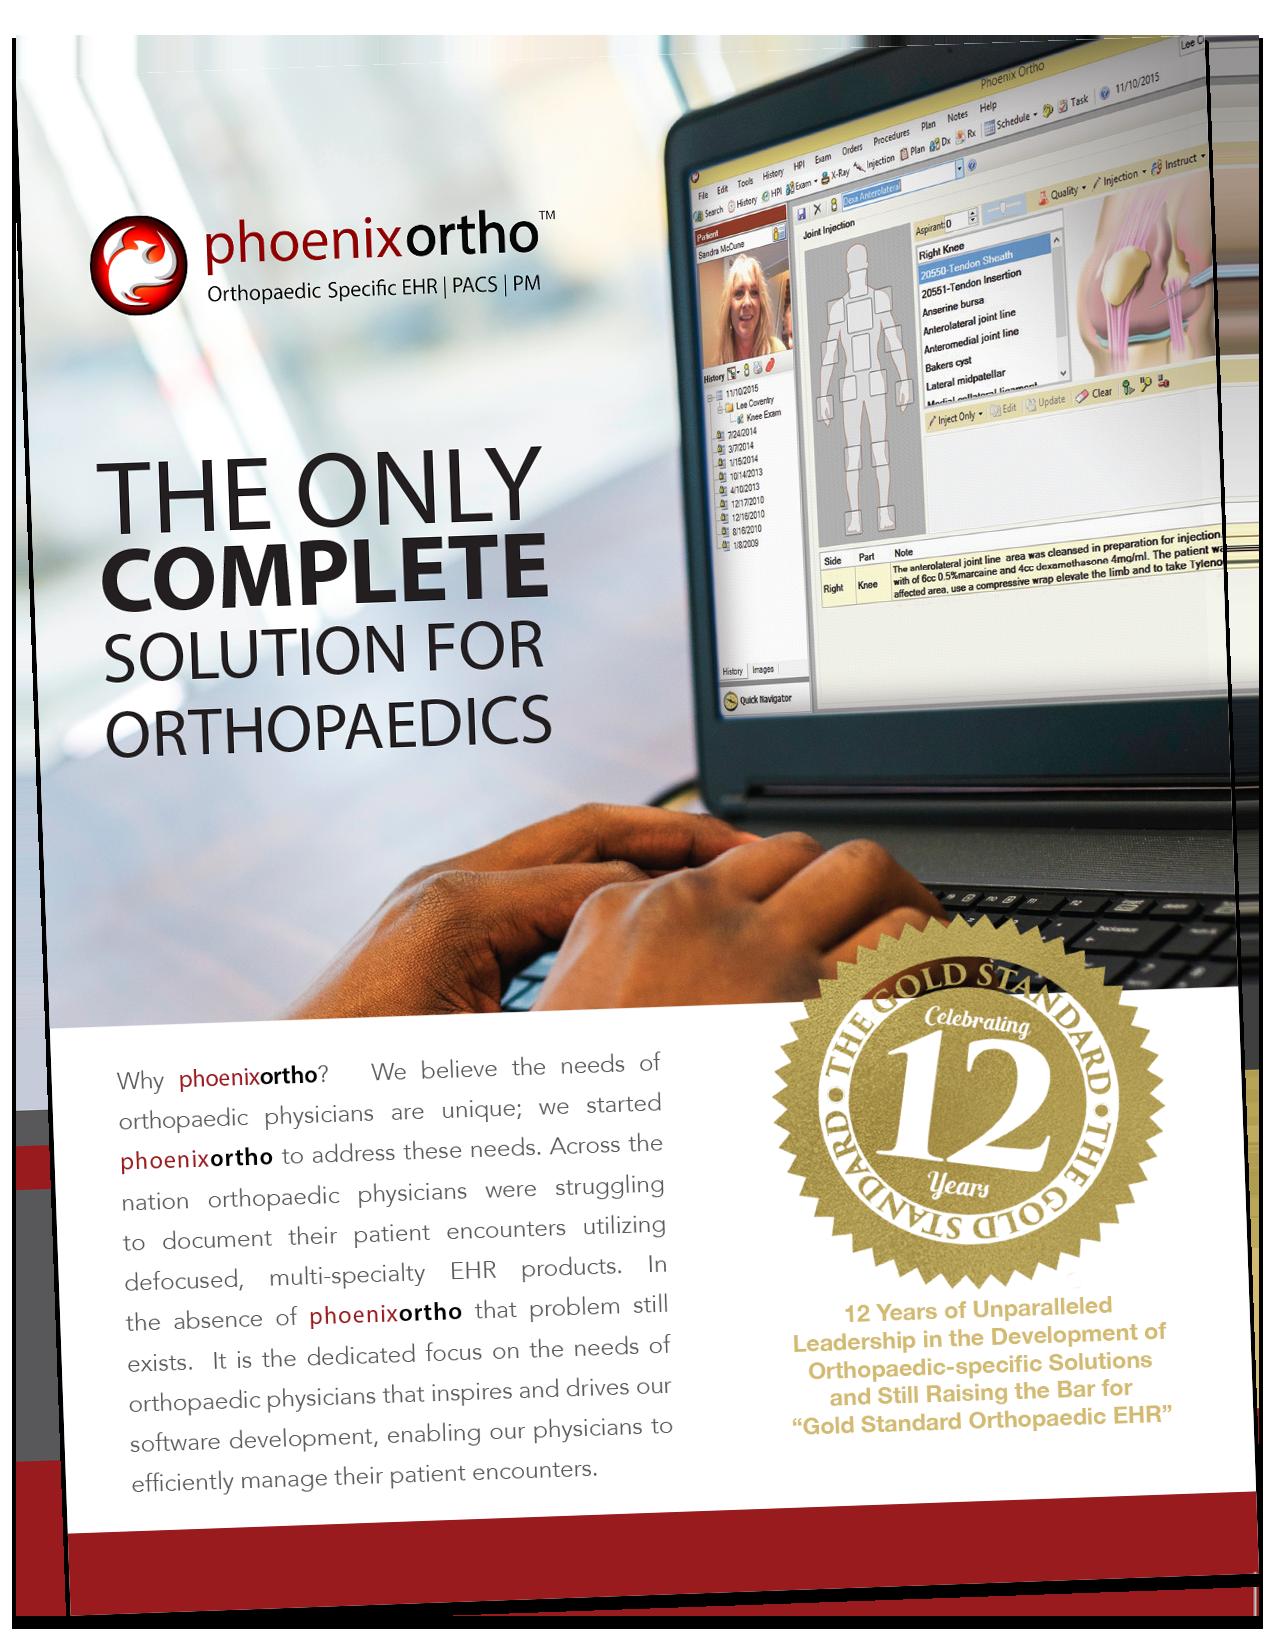 Phoenix Ortho 2018 brochure cover.png